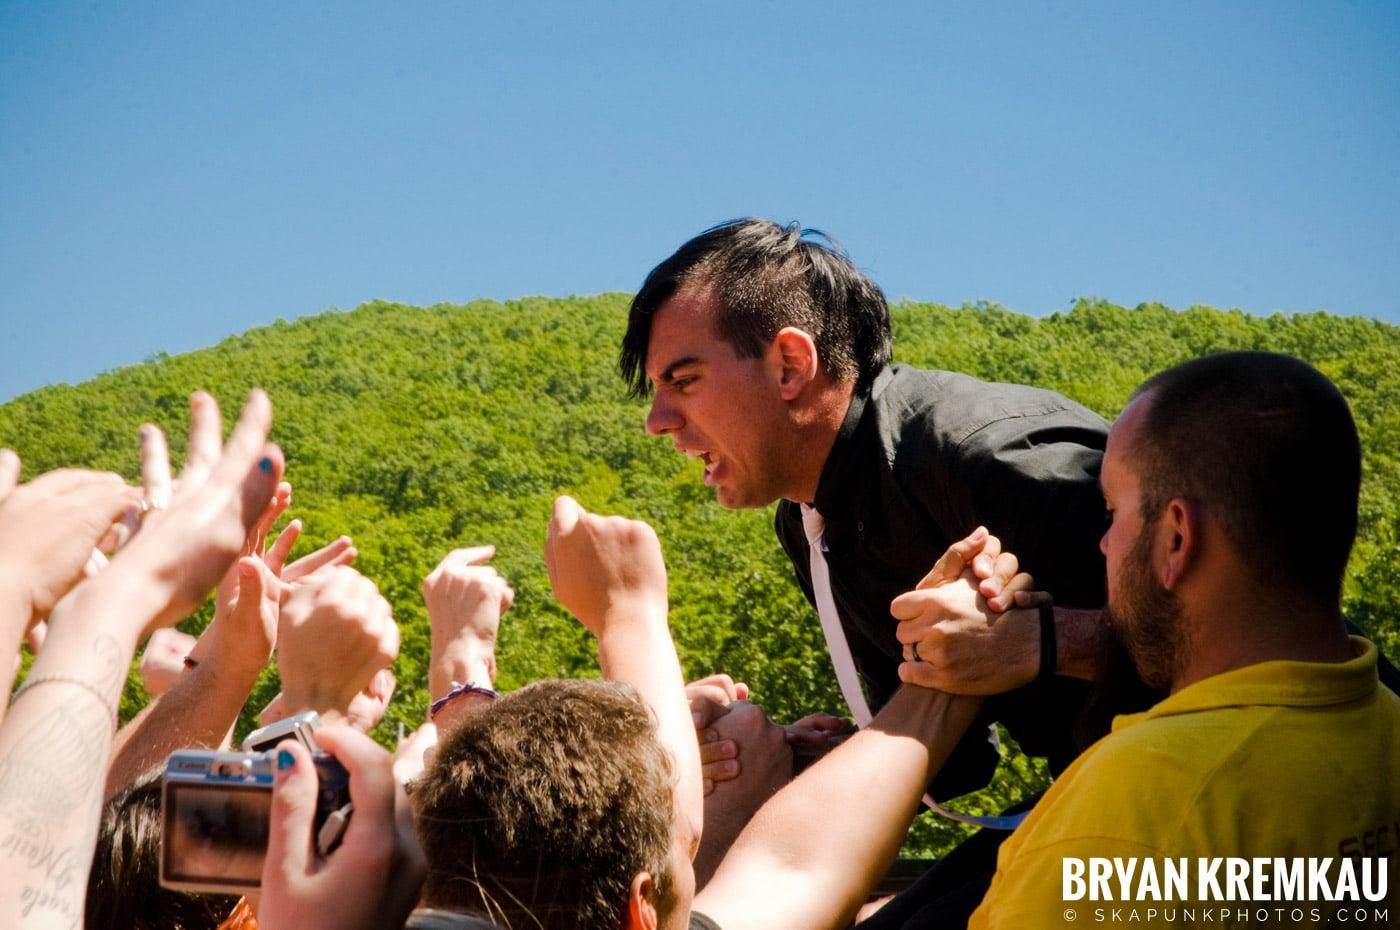 Anti-Flag @ Warped Tour 2009, Scranton PA - 07.15.09 (1)